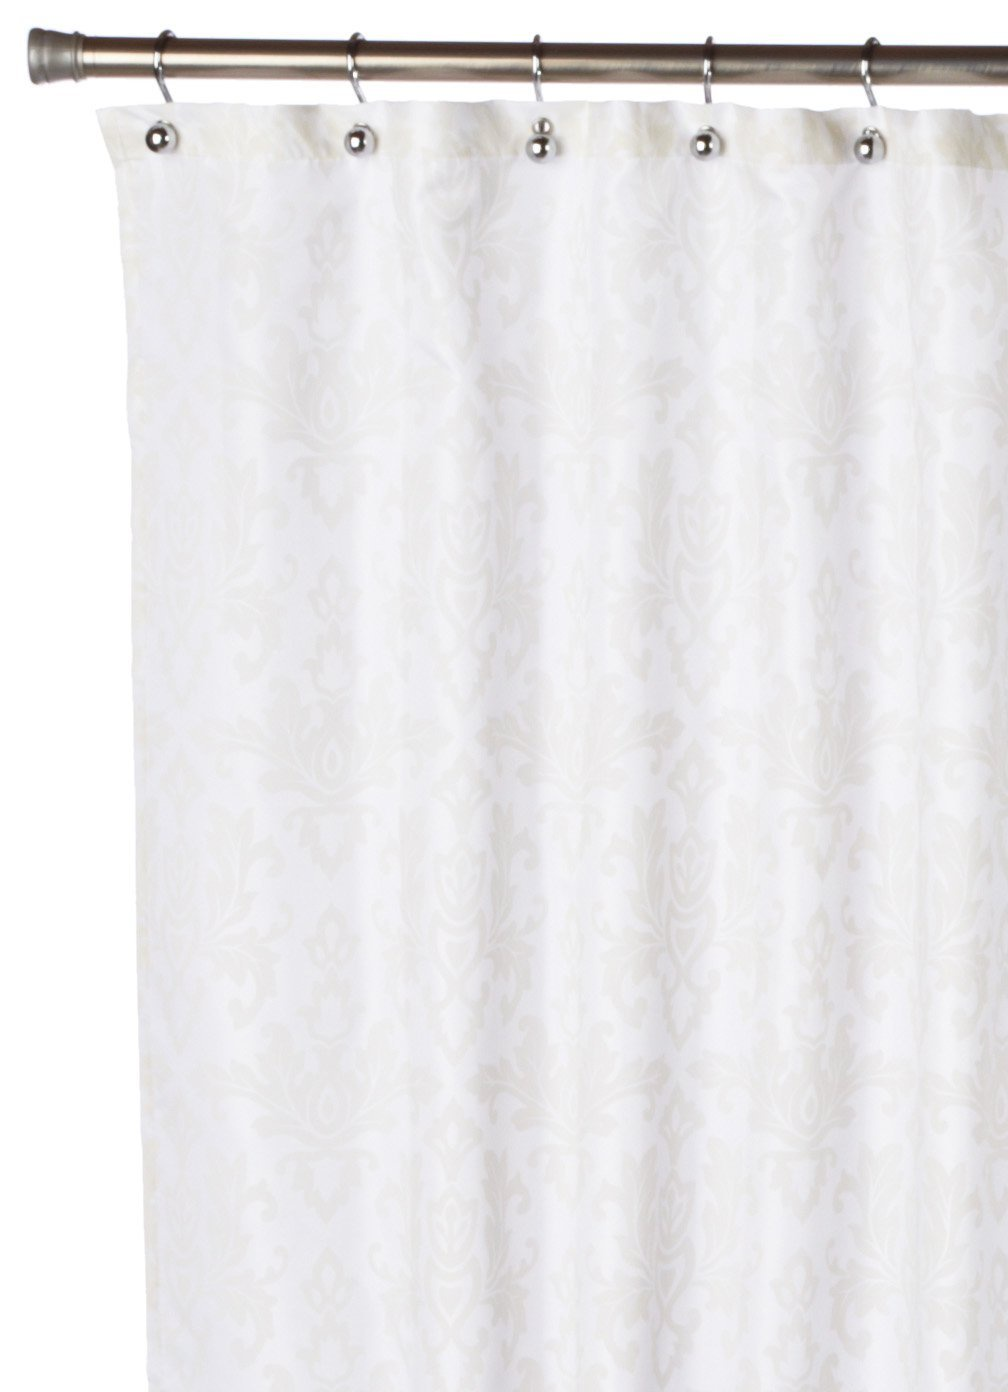 все цены на Штора для ванной Carnation Home Fashions Damask Ivory, белый, кремовый онлайн